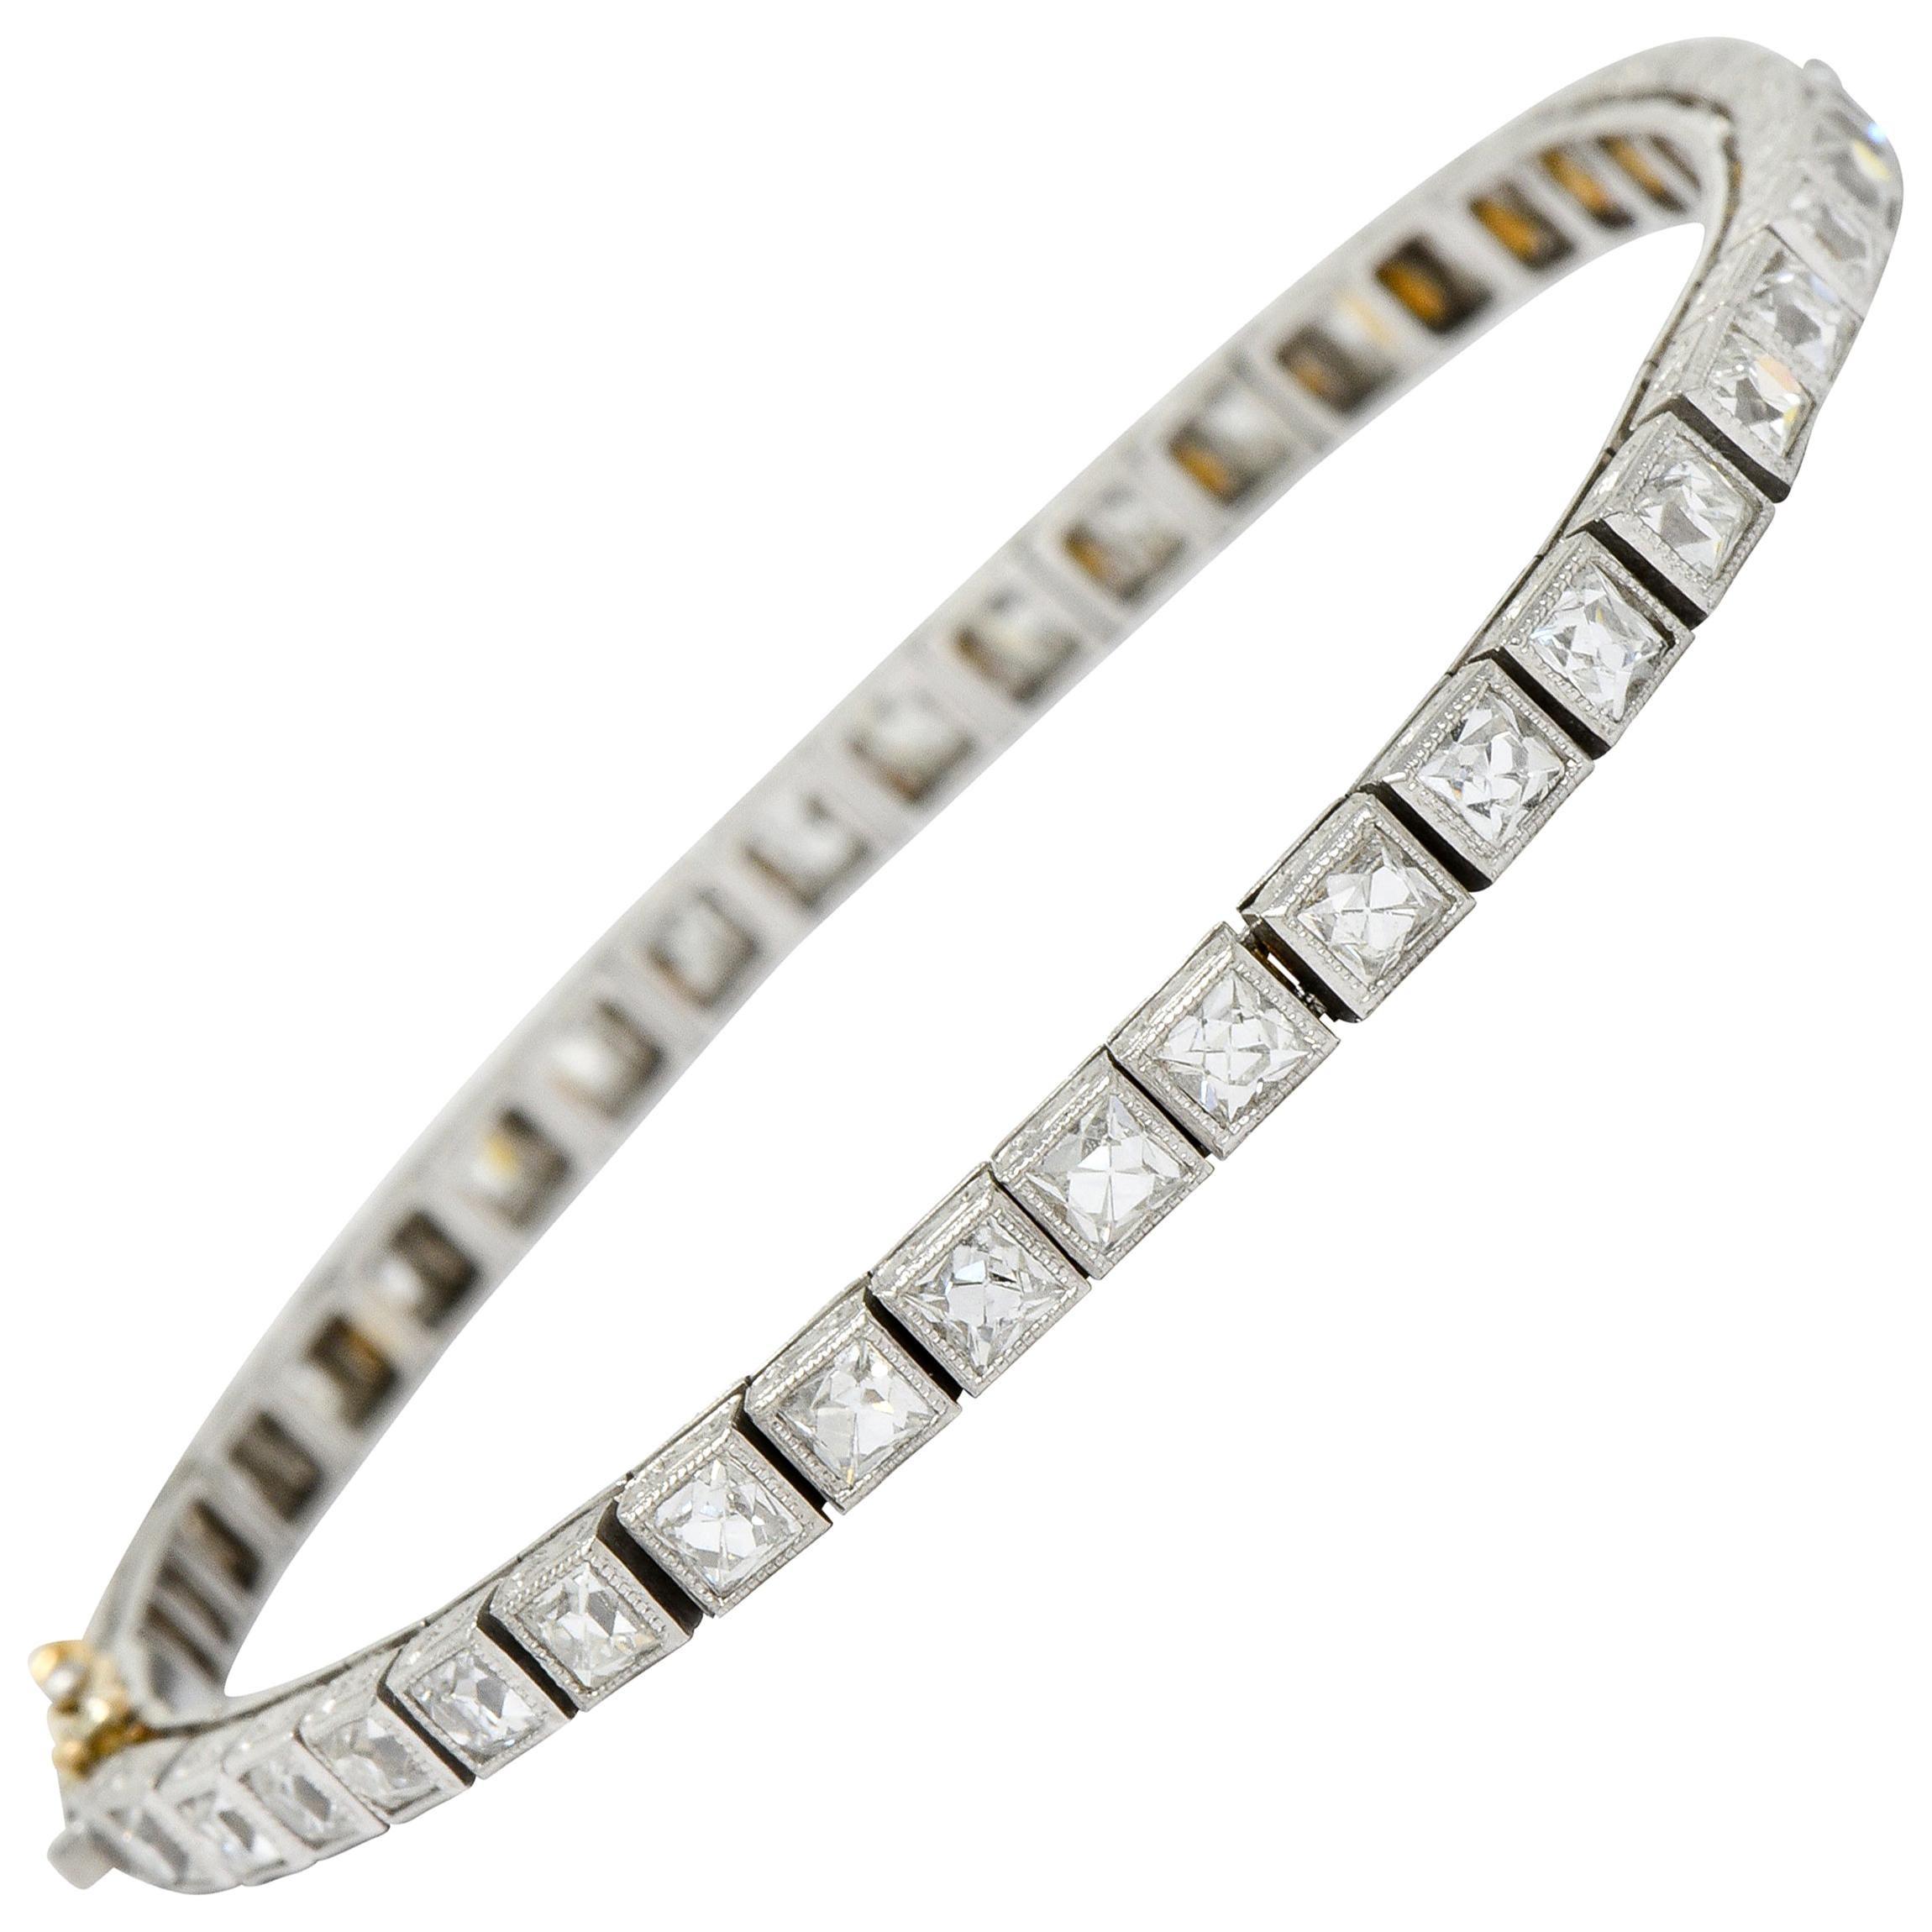 Art Deco 7.00 Carat French Cut Diamond Platinum Line Bracelet, circa 1930